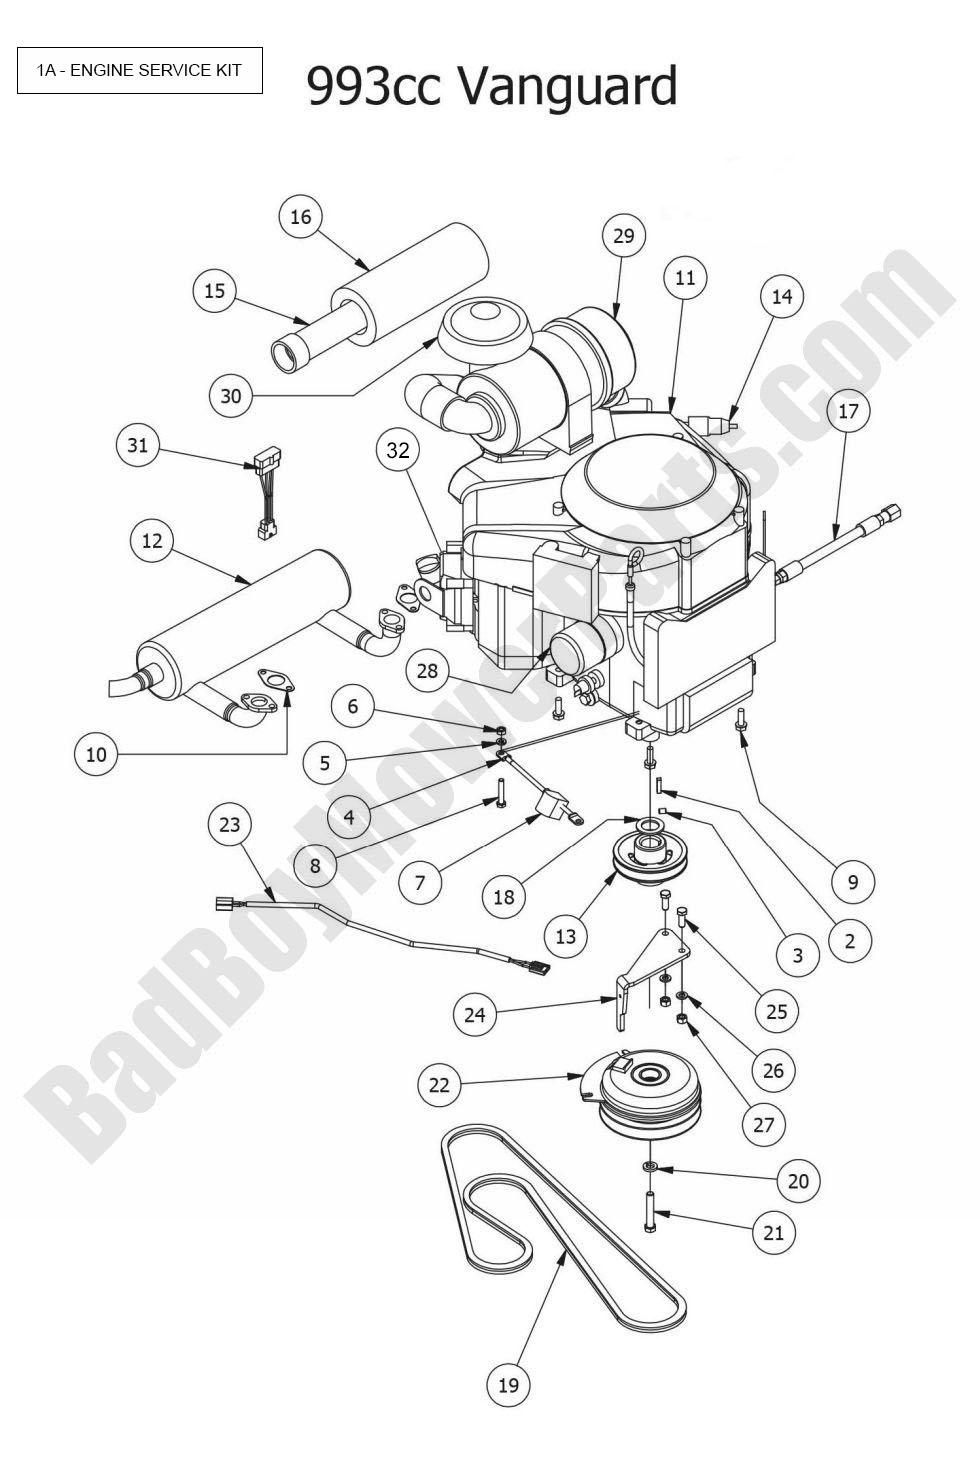 wolo bad boy wiring diagram intertherm horn library 2015 outlaw xp engine vanguard 993cc rh badboymowerparts com air